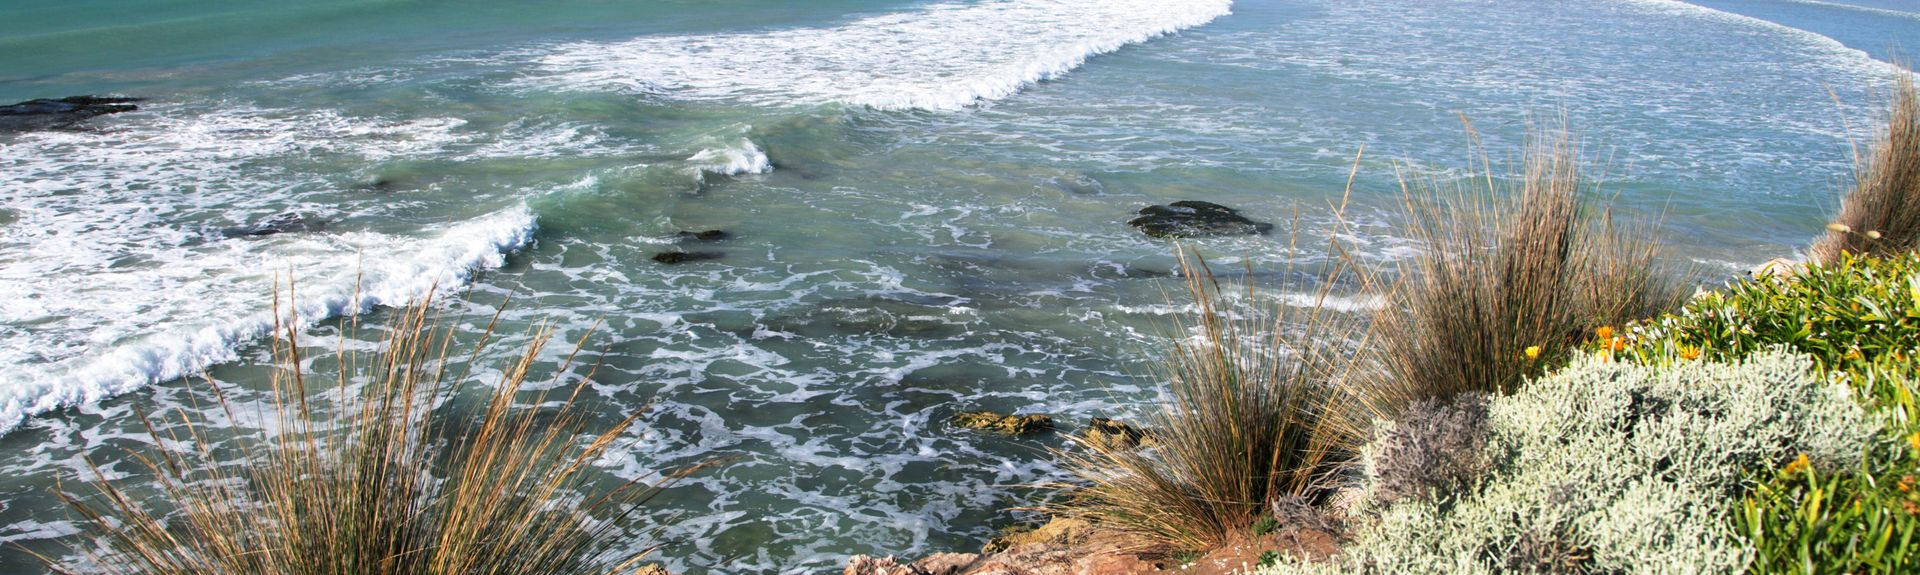 Long Beach, Robe, South Australia, Australia